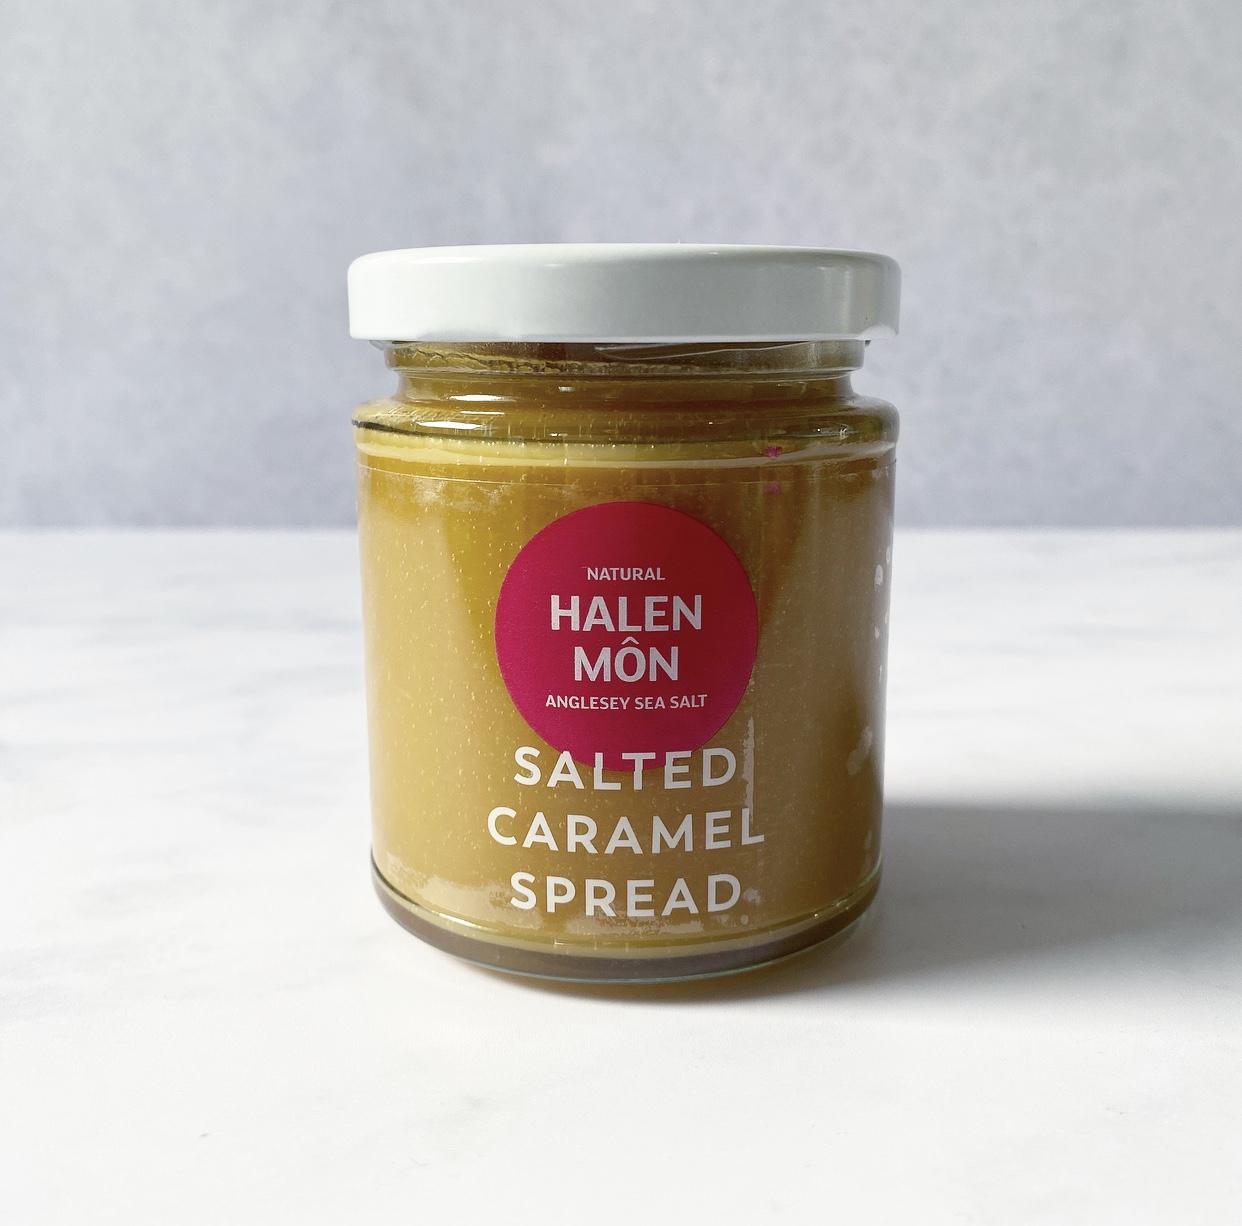 Halen Môn Salted Caramel  Spread